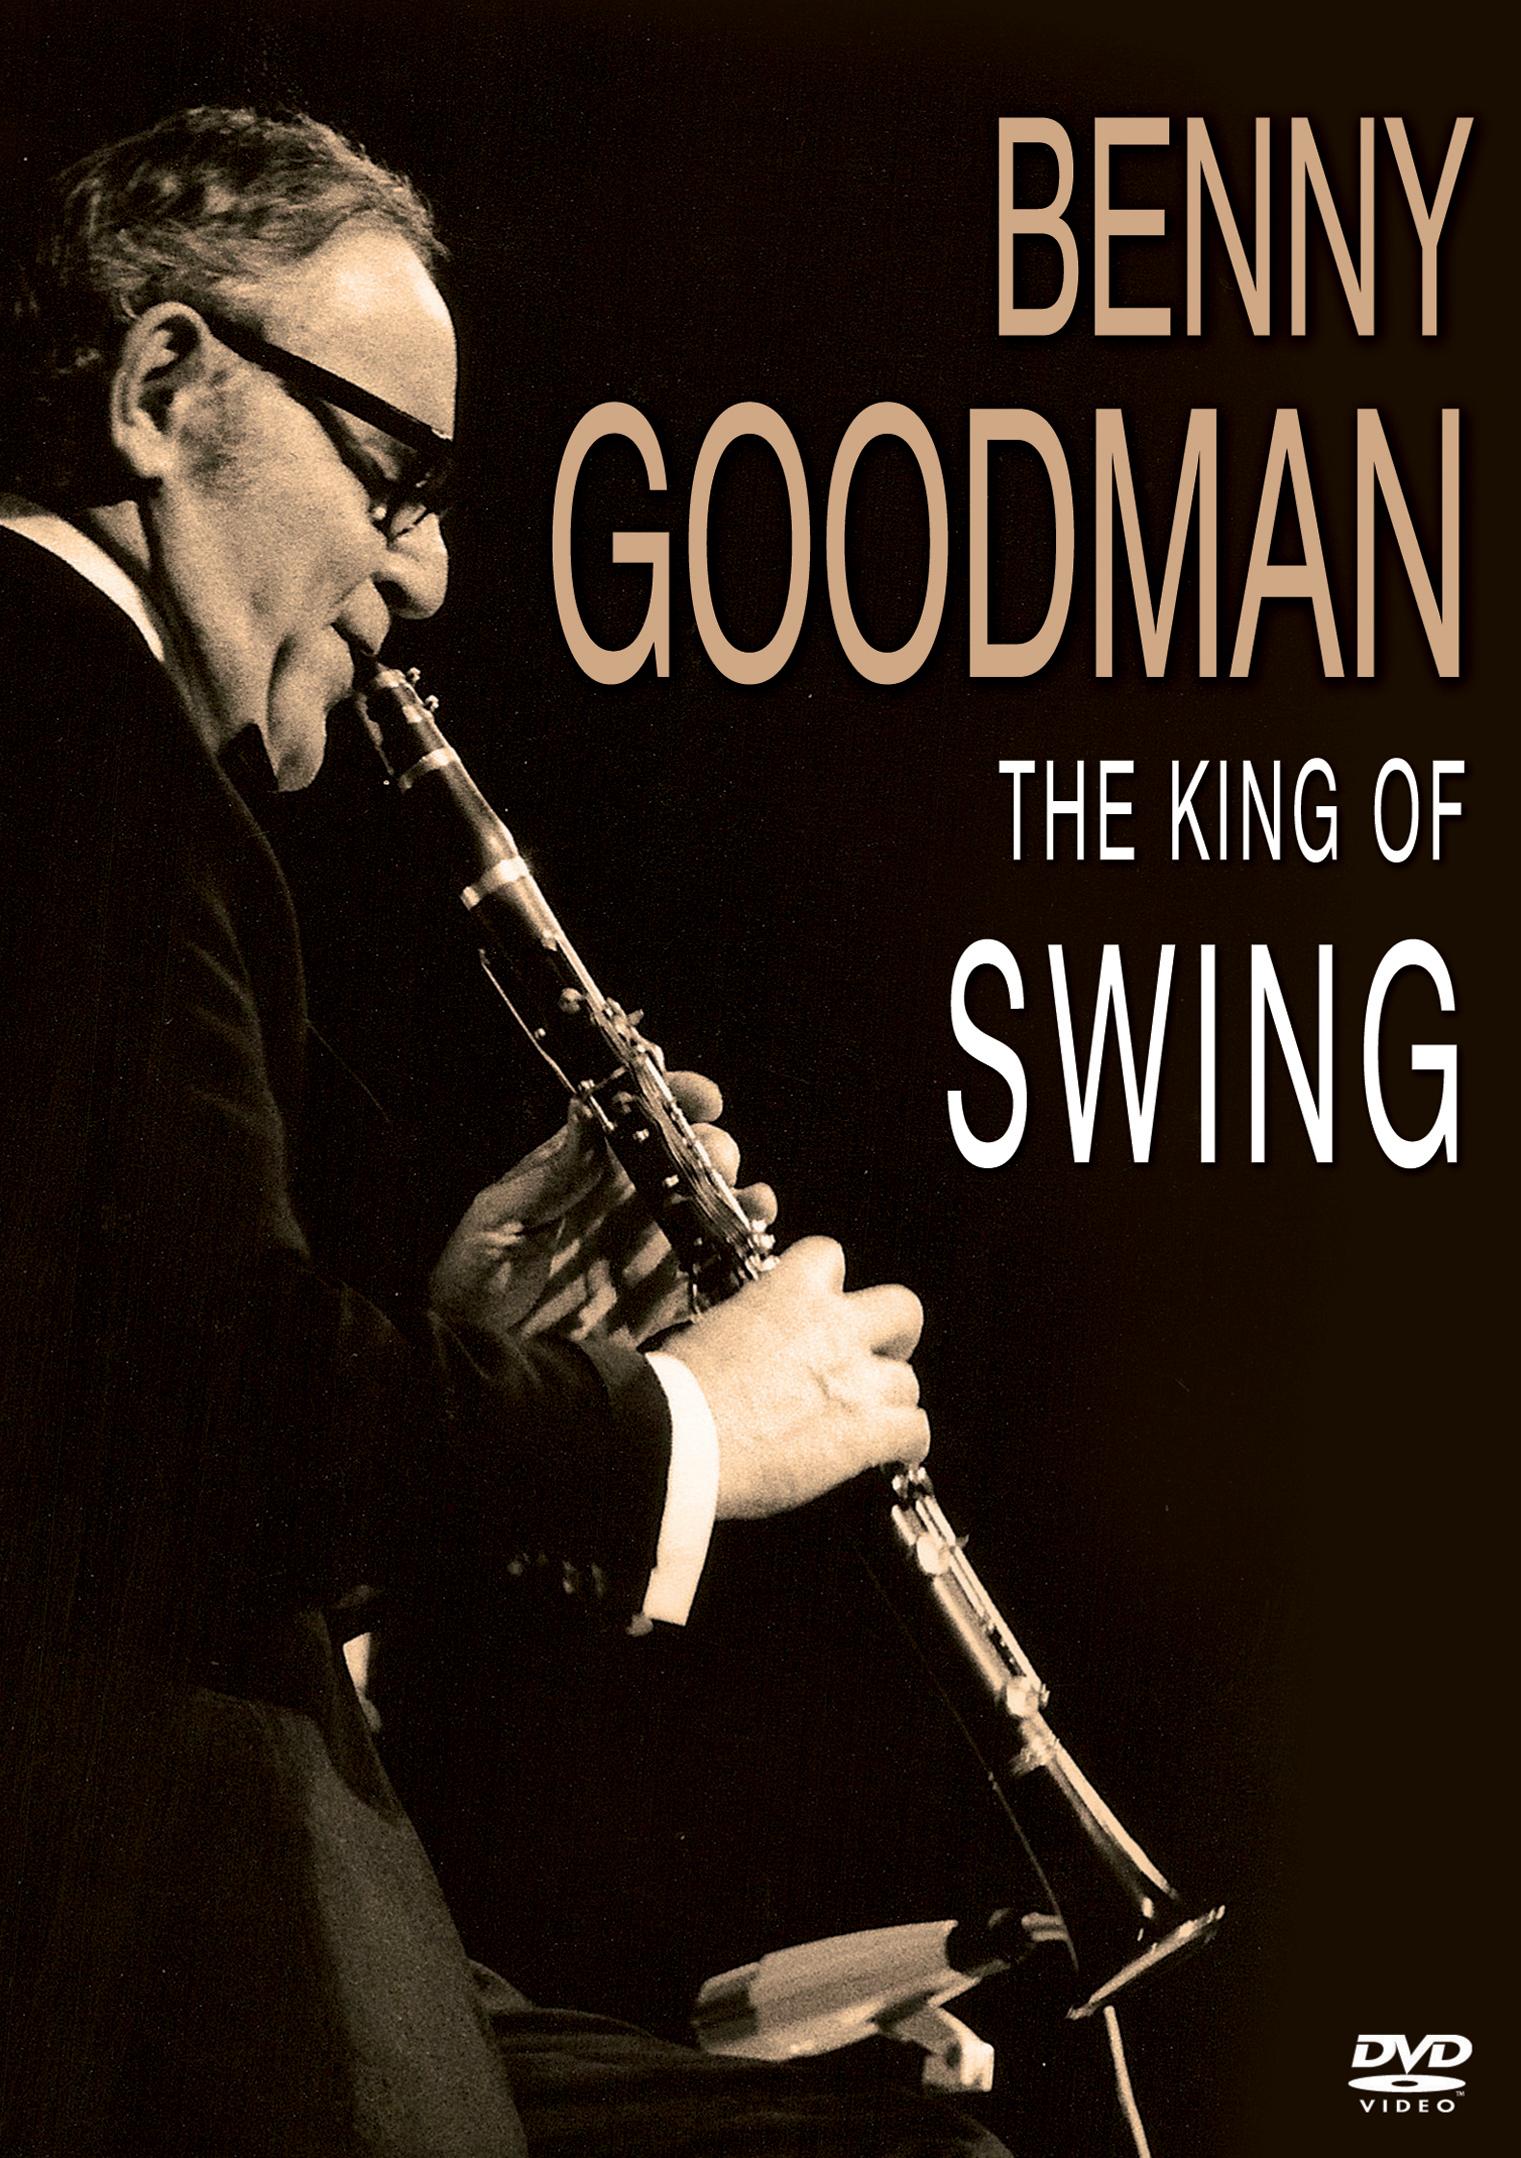 Benny Goodman: The King of Swing